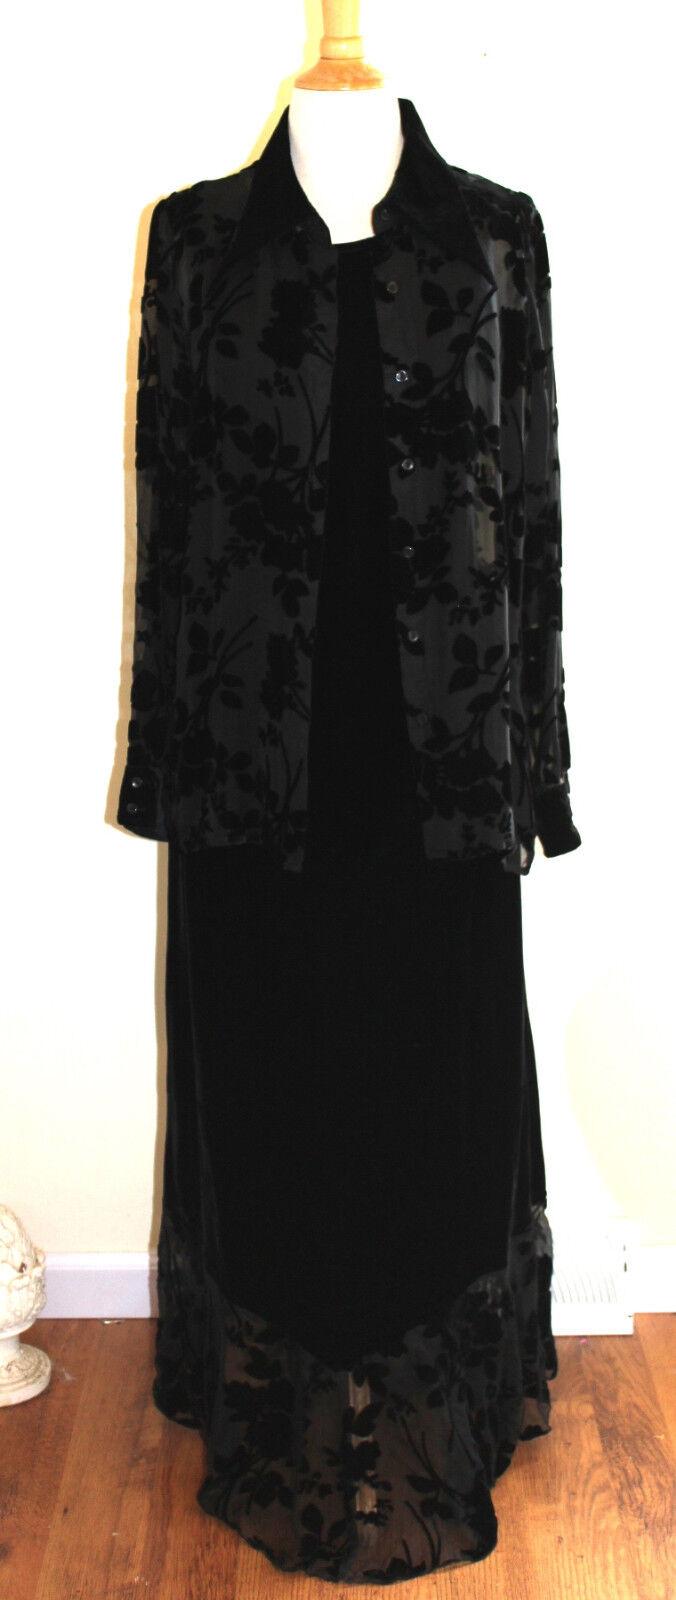 April Cornell Elegant schwarz Floral Burnout Art-to-Wear Jacket Top + Dress Sz M